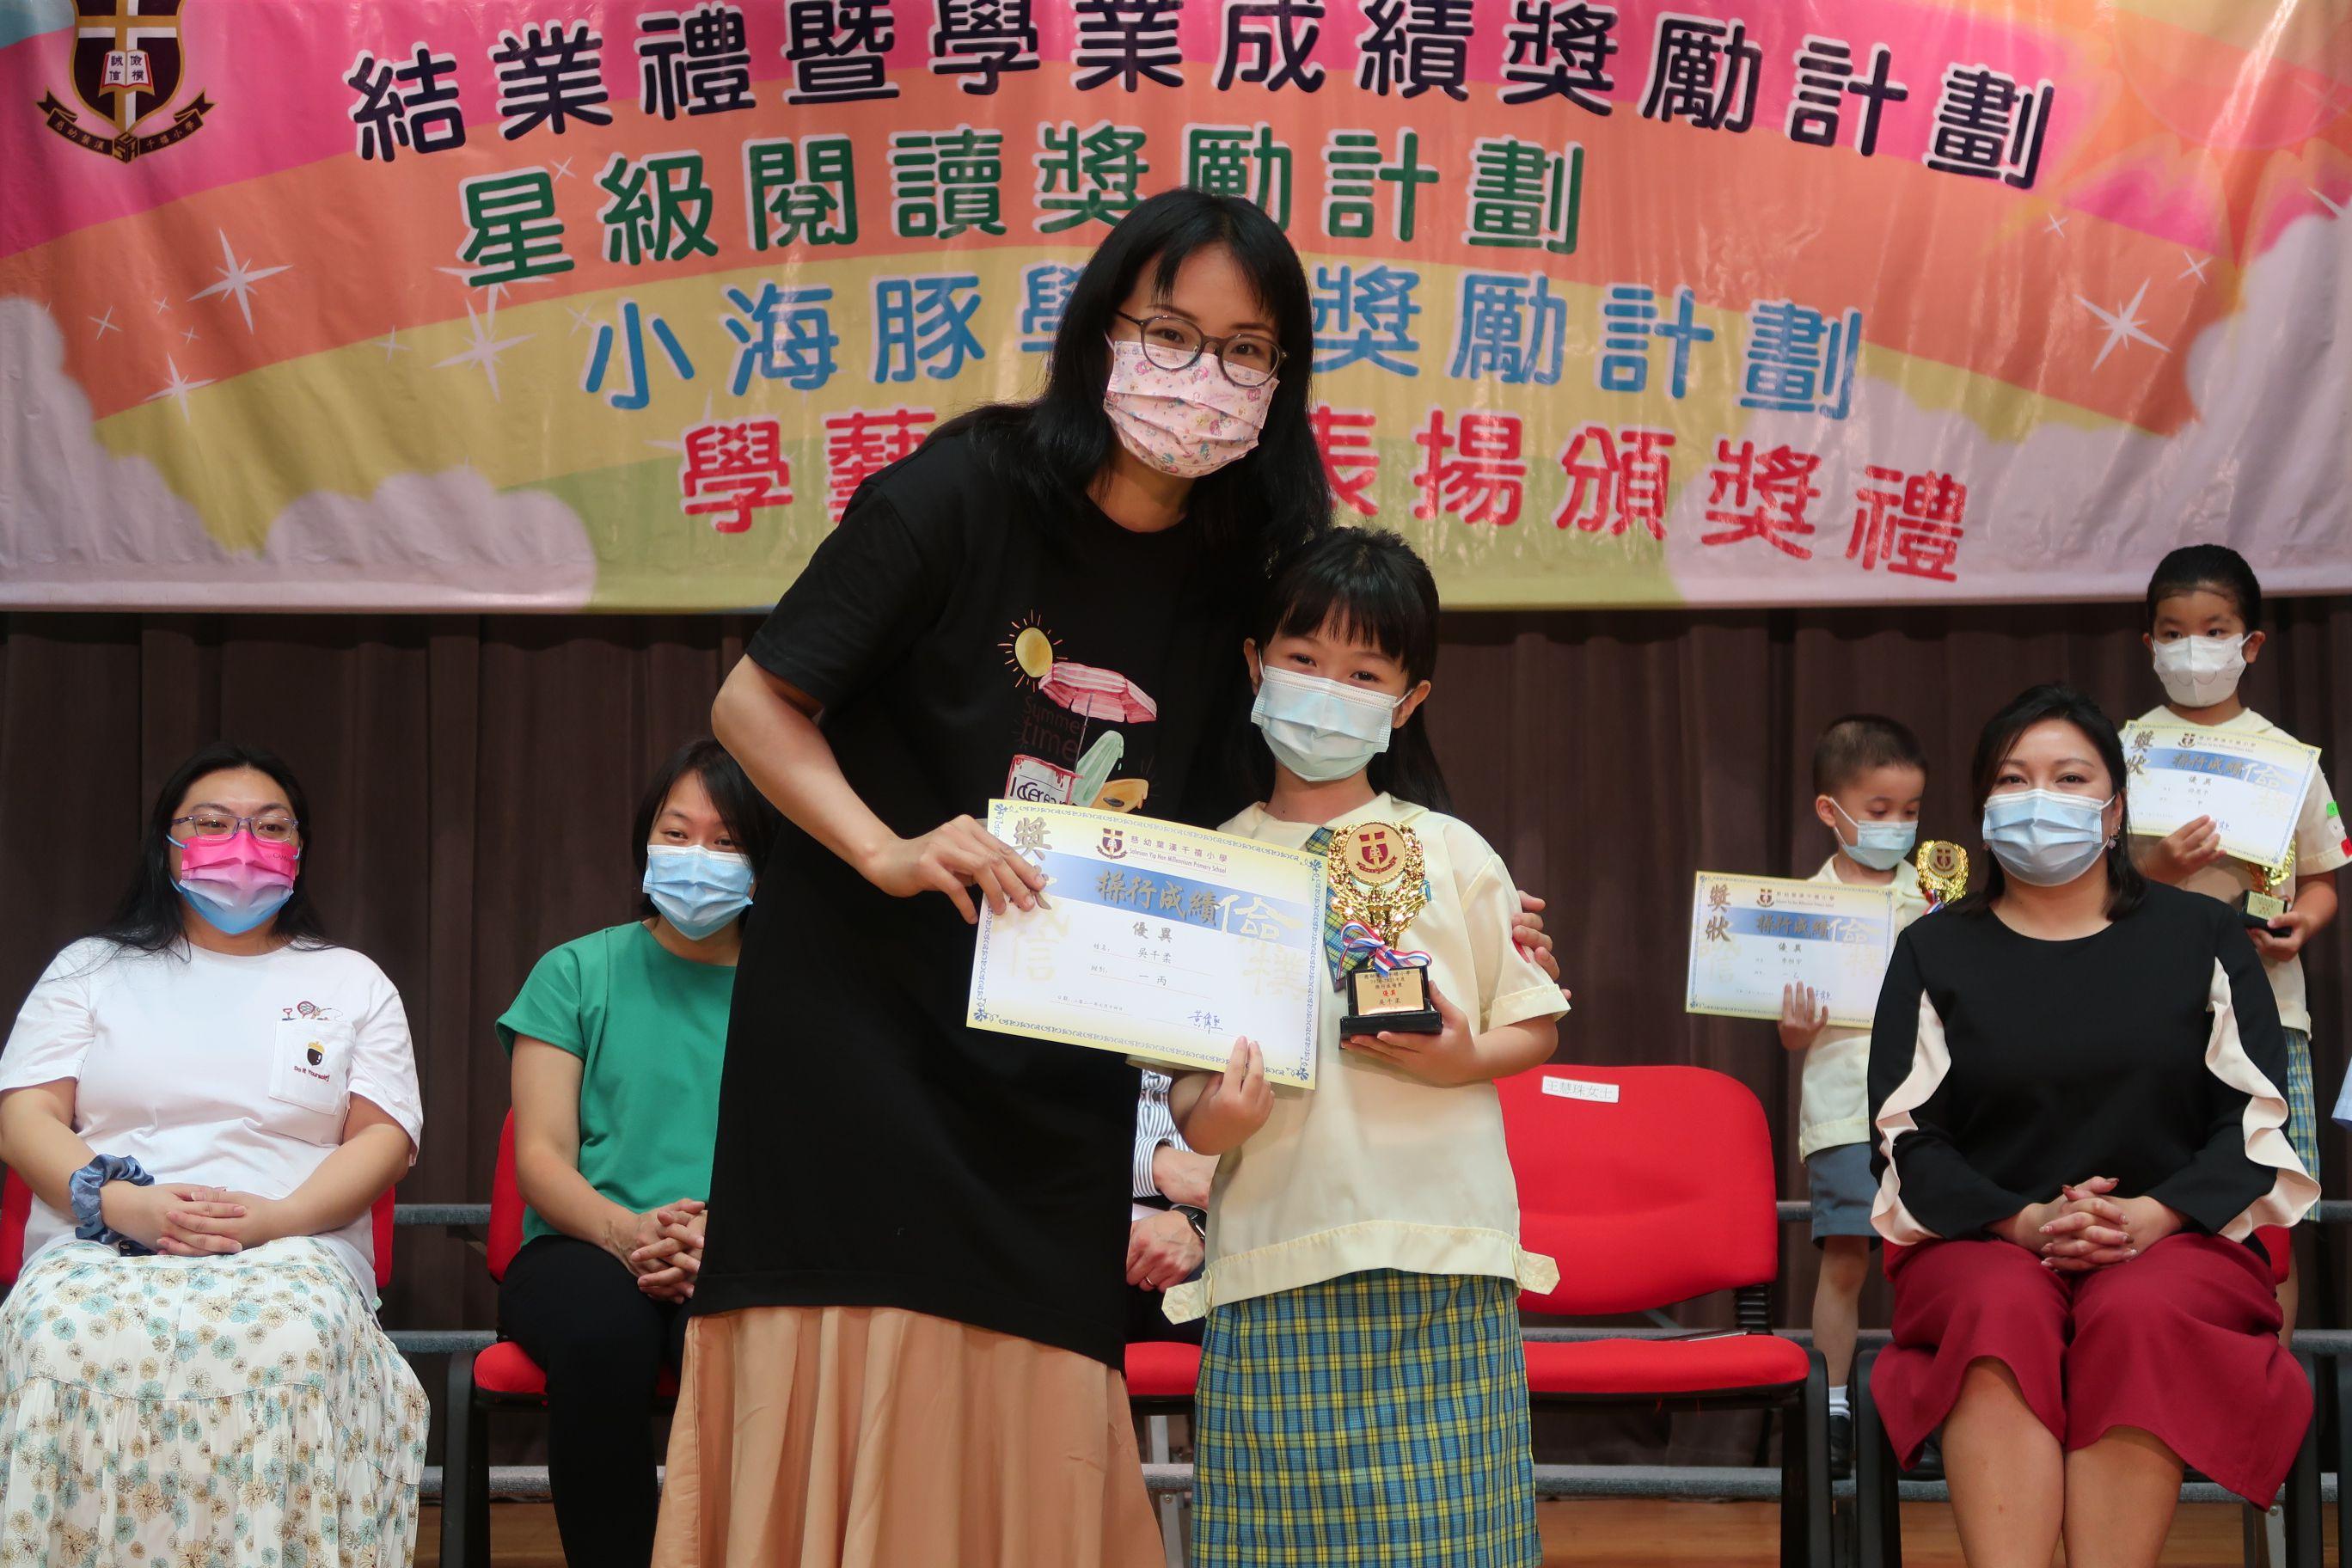 https://syh.edu.hk/sites/default/files/img_5466.jpg